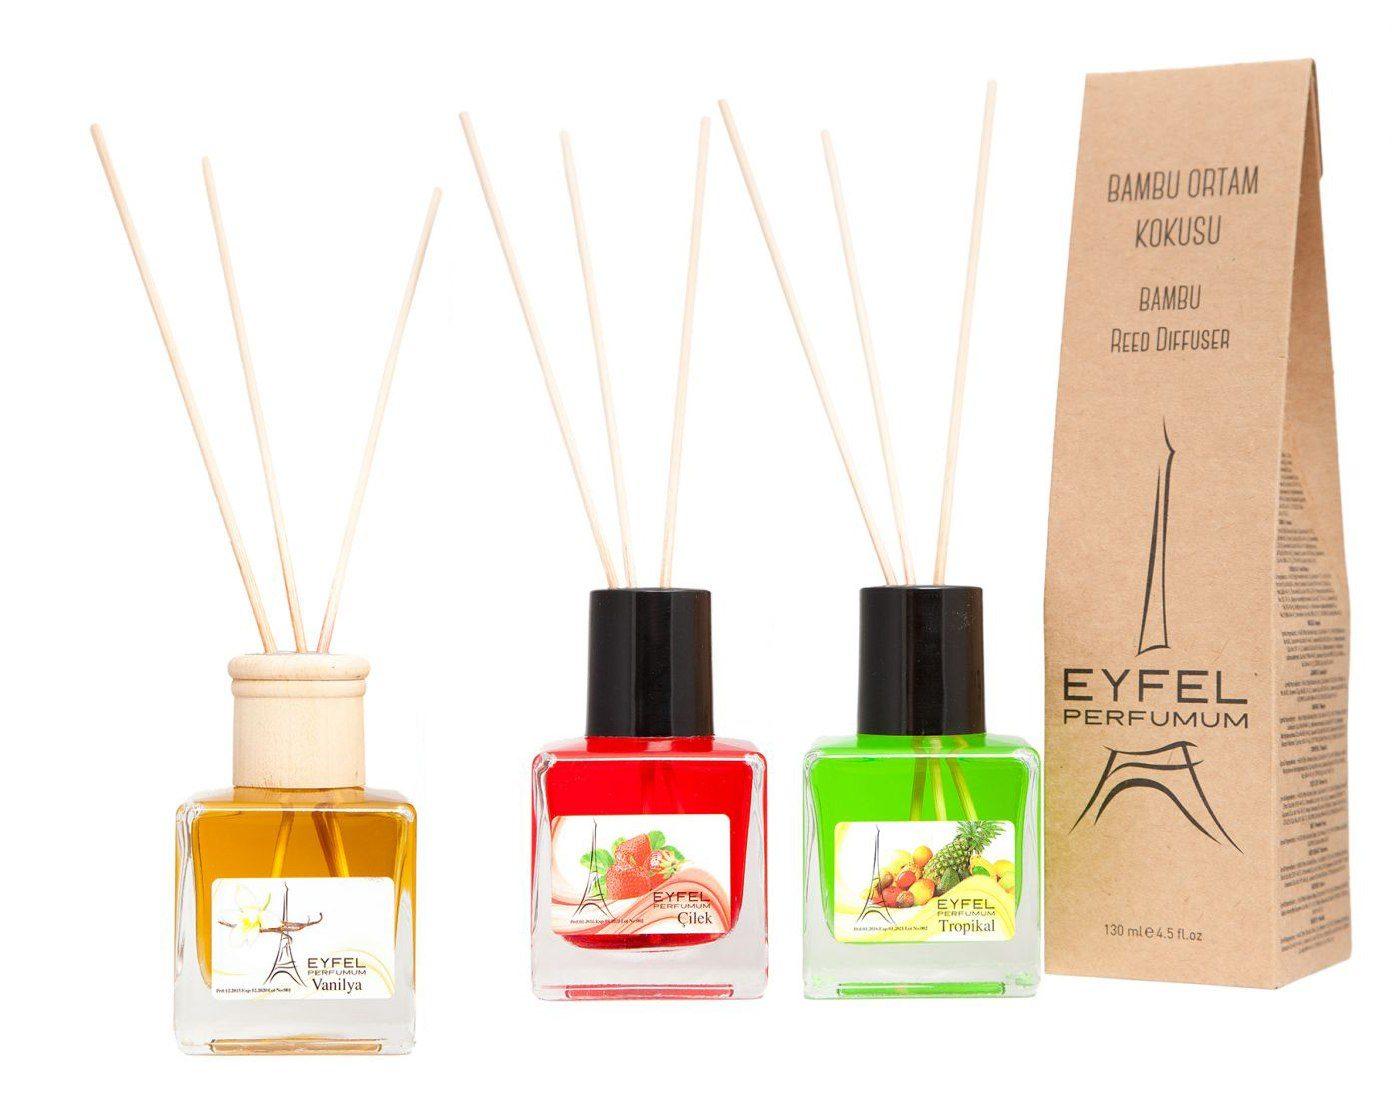 аромадиффузоры Eyfel Perfume